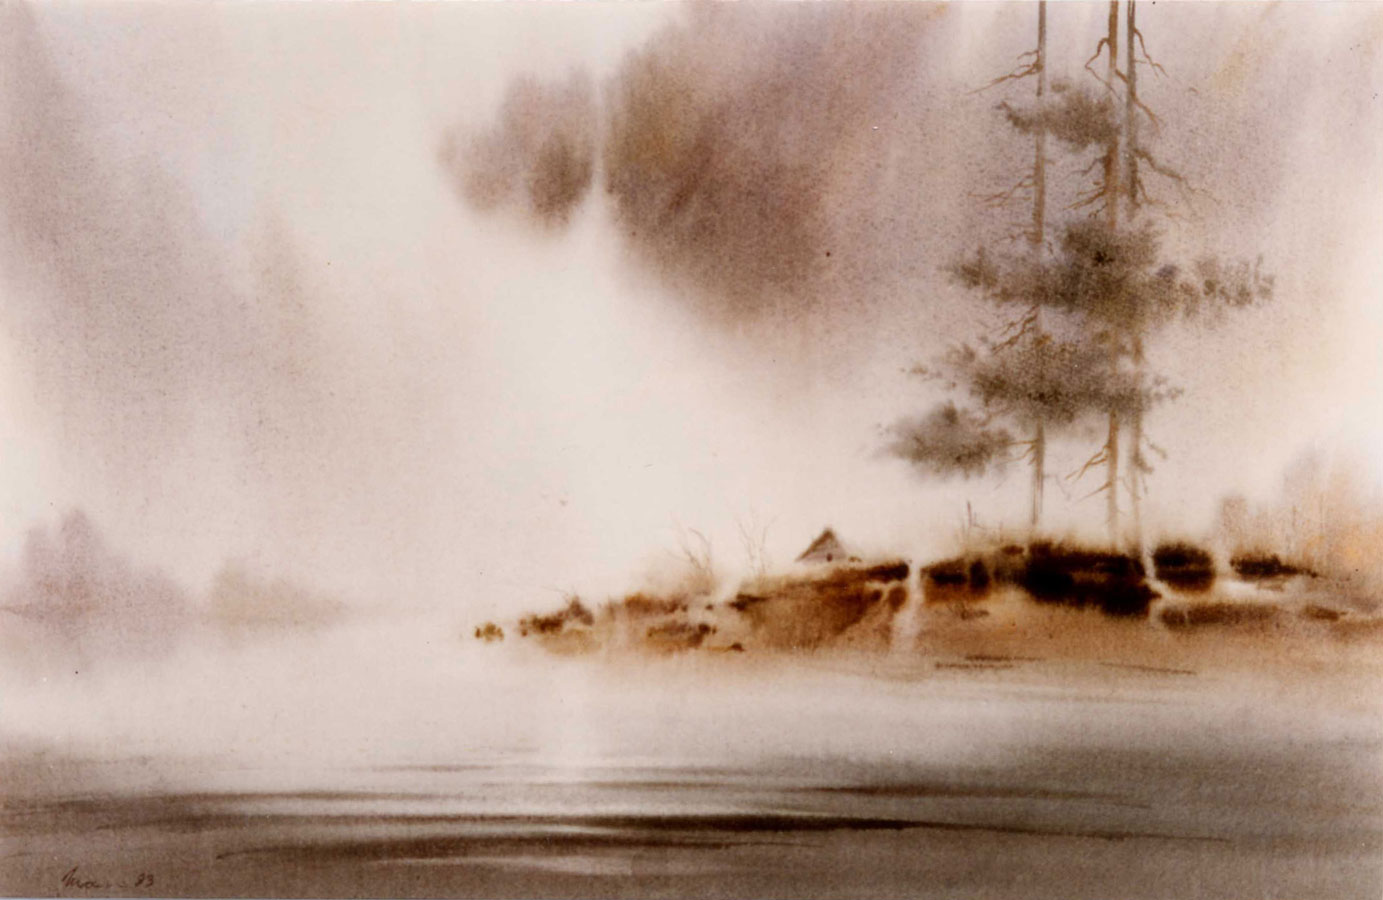 watercolor paintings wet-on-wet artist Shalum Shalumov landscape fine art aquarelle Акварель Шалум Шалумов